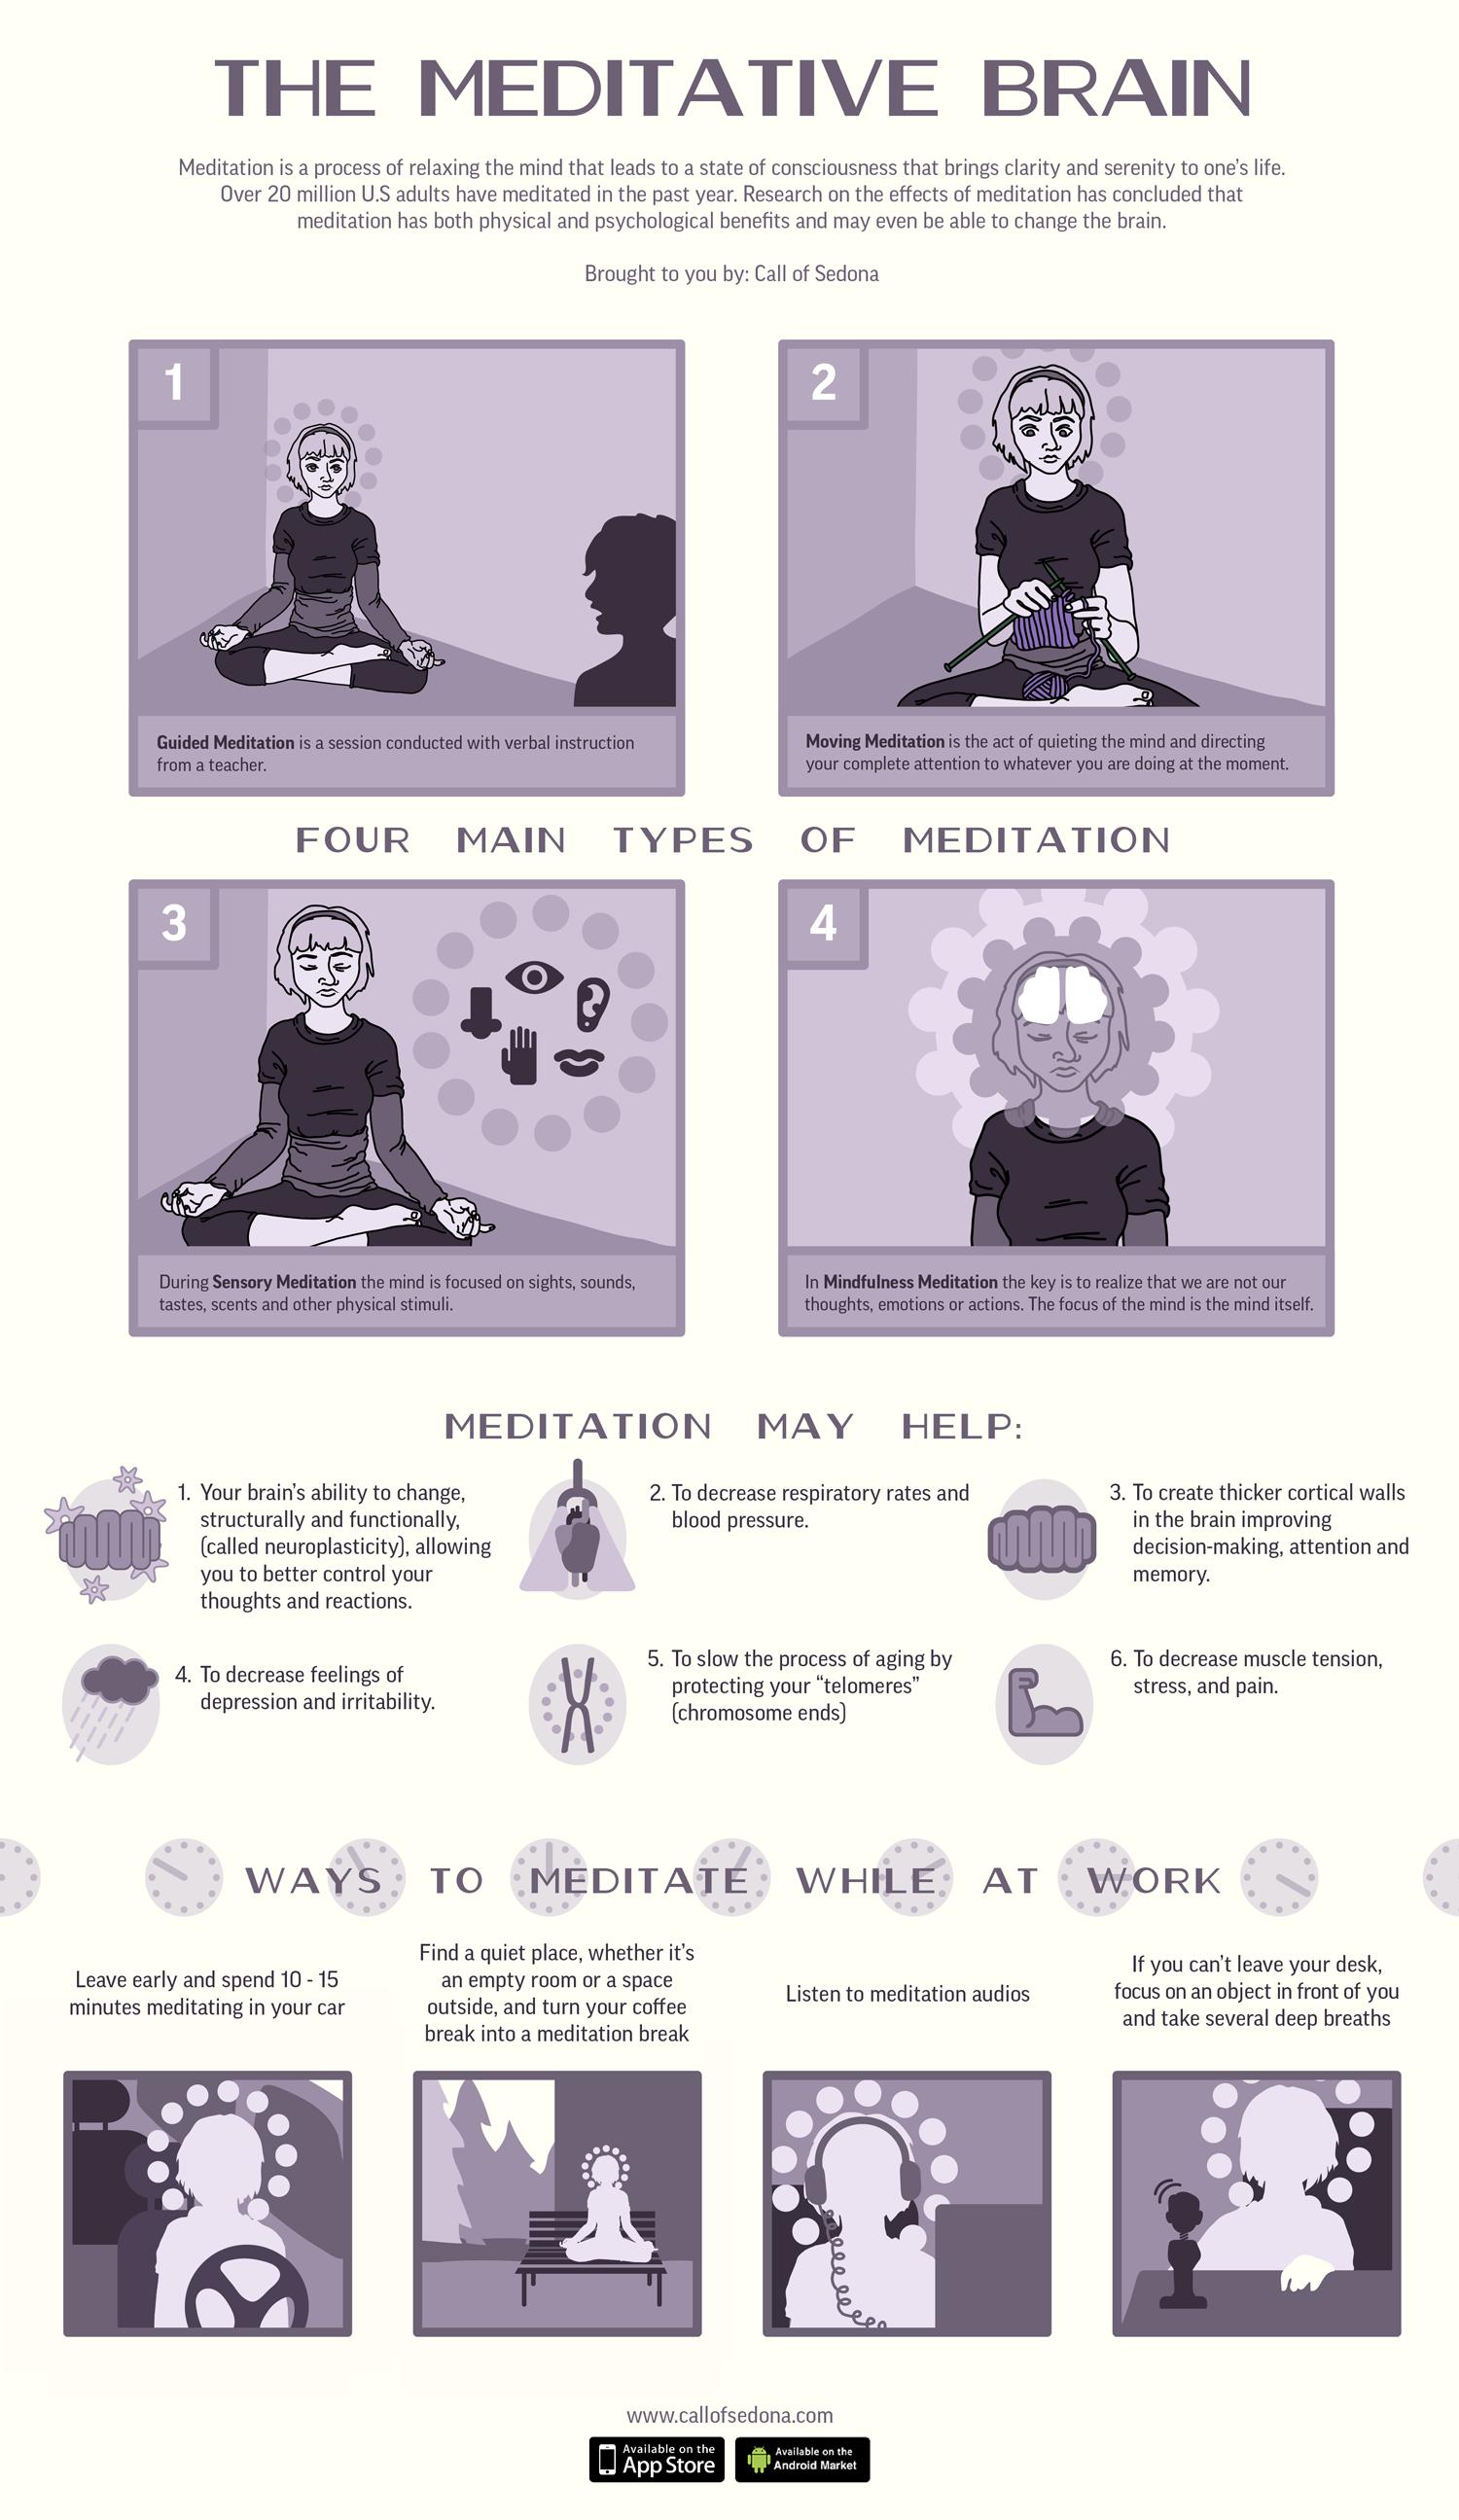 The Meditative Brain